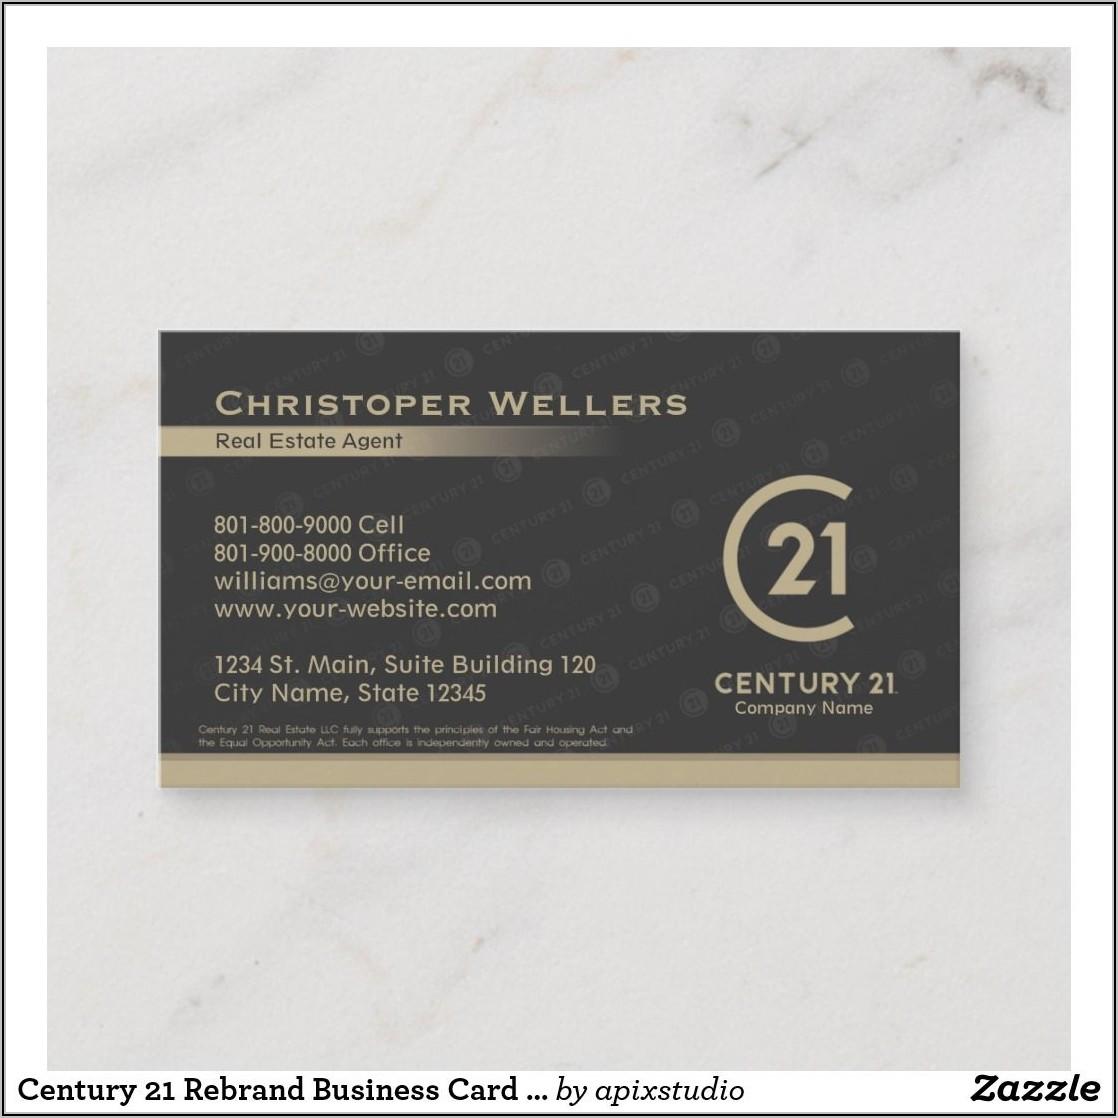 Century 21 Rebrand Business Cards